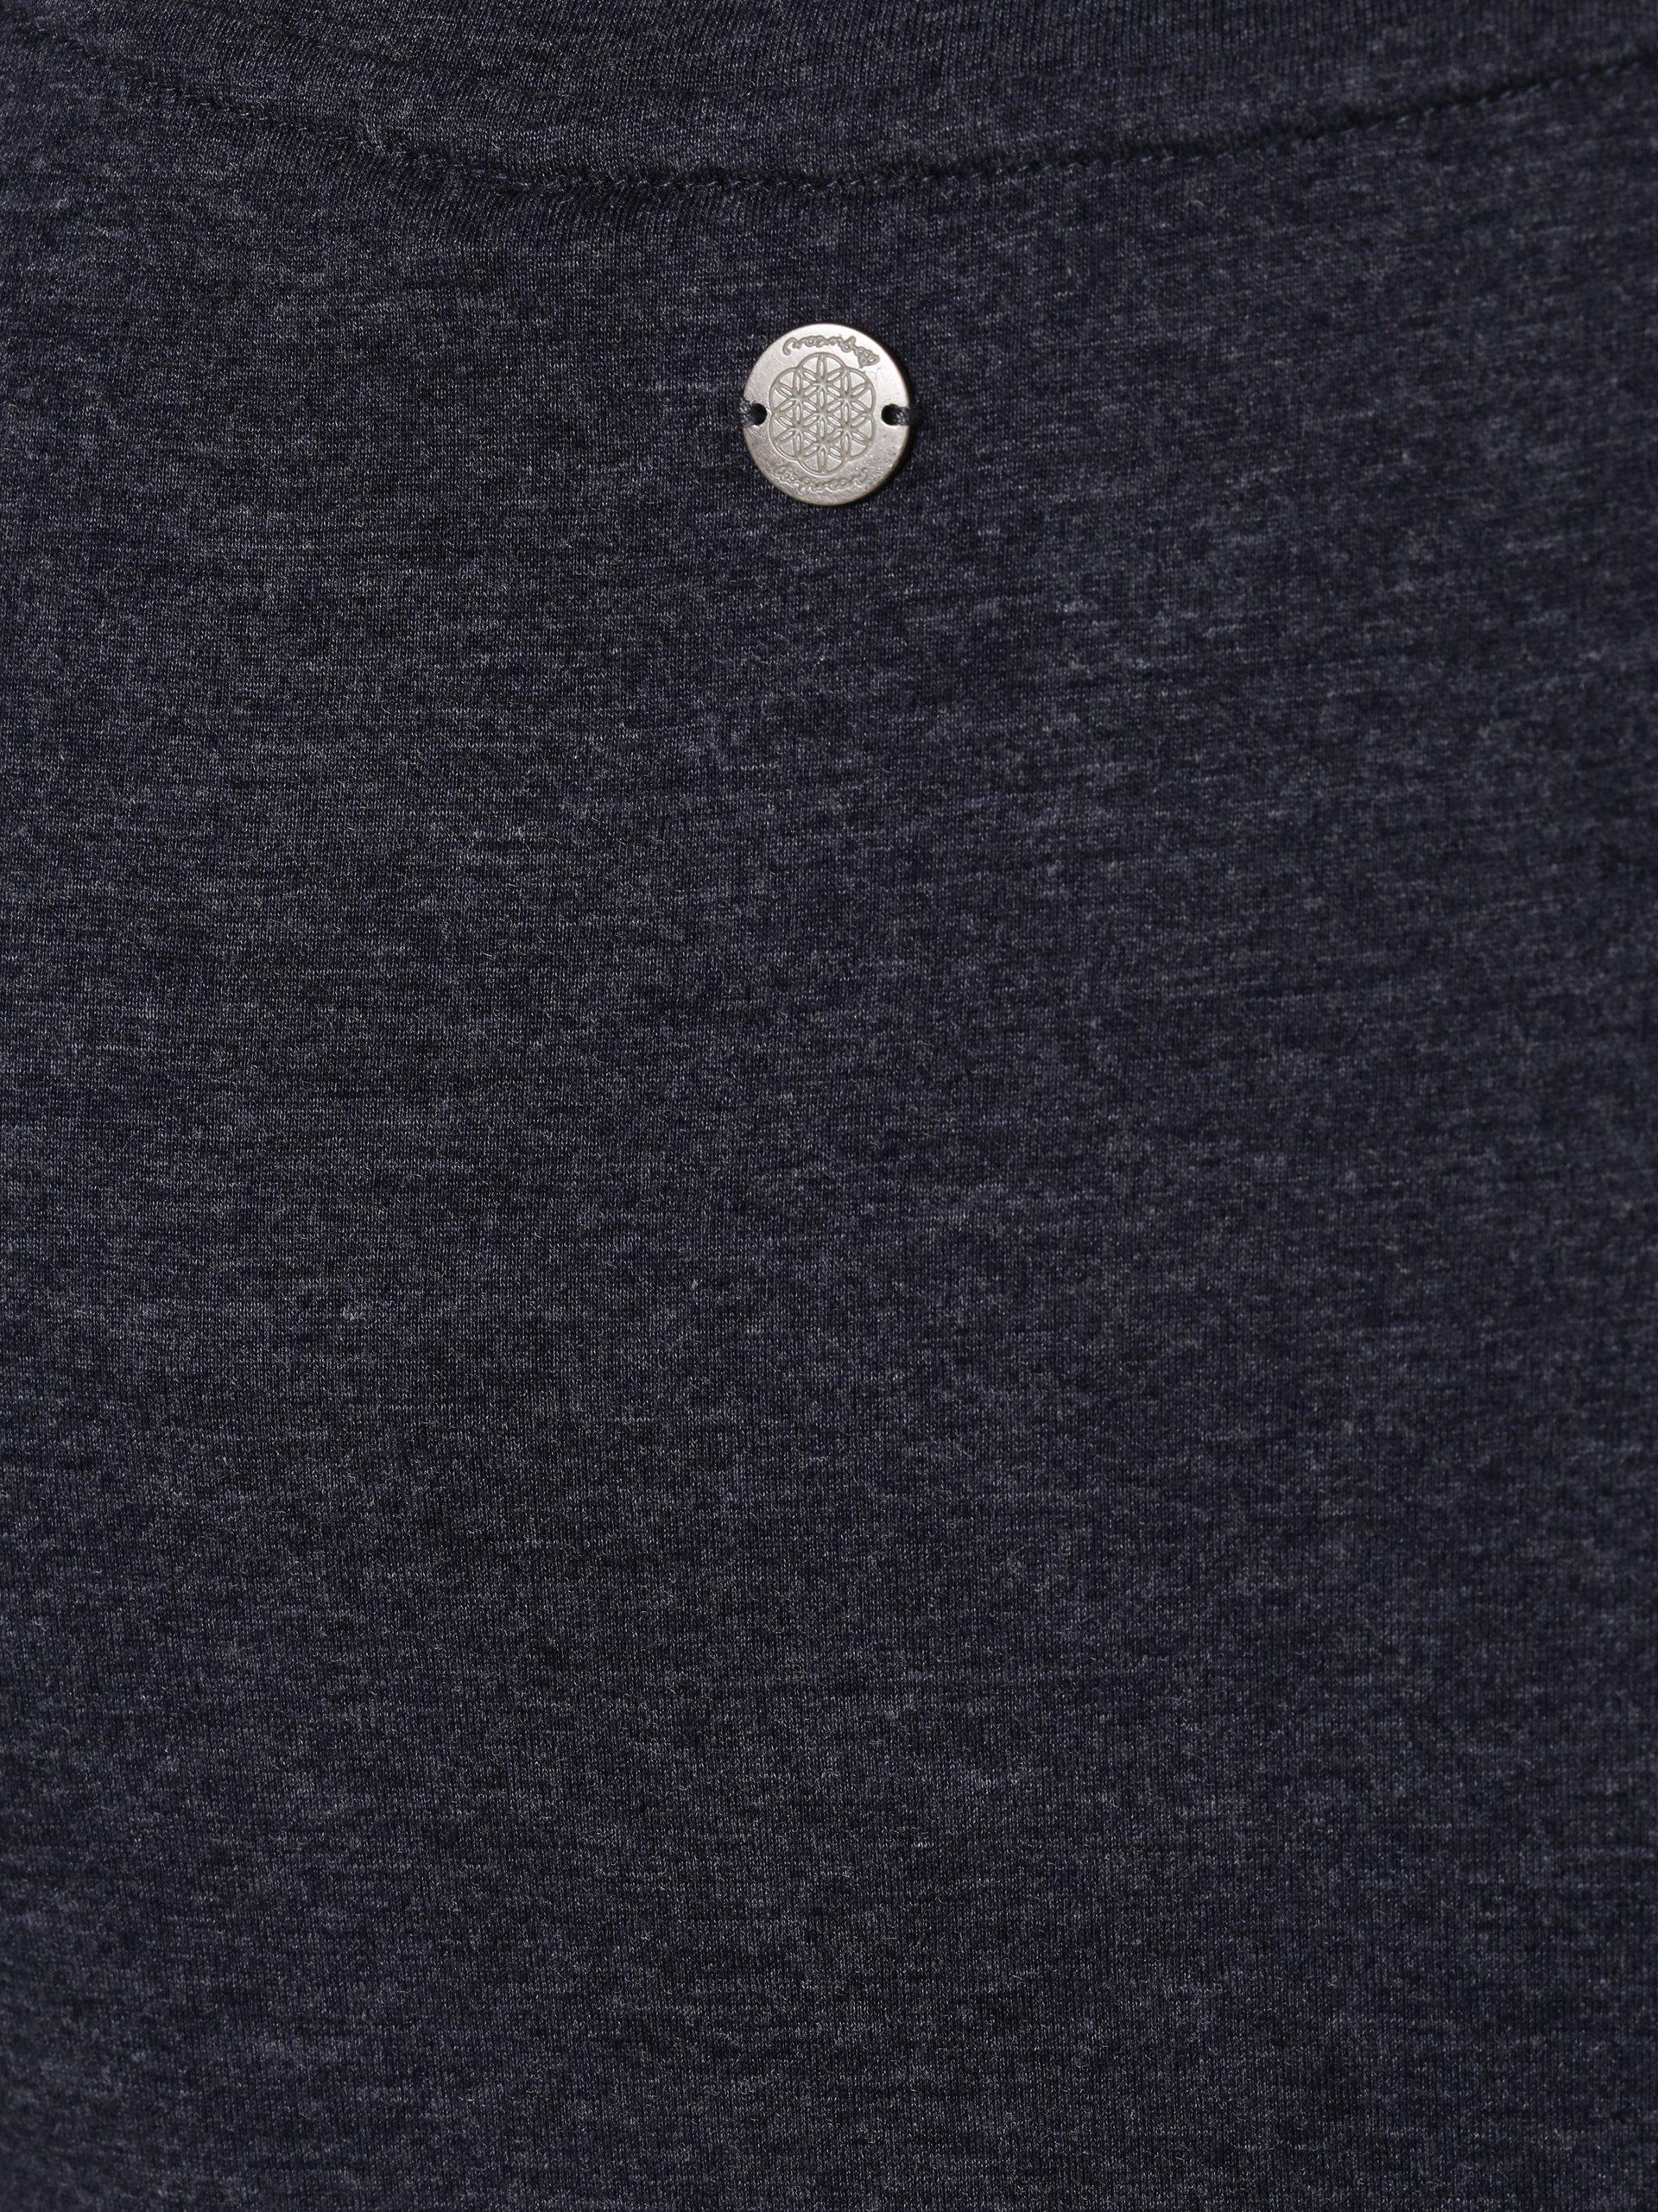 Ragwear Damen T-Shirt - Florah